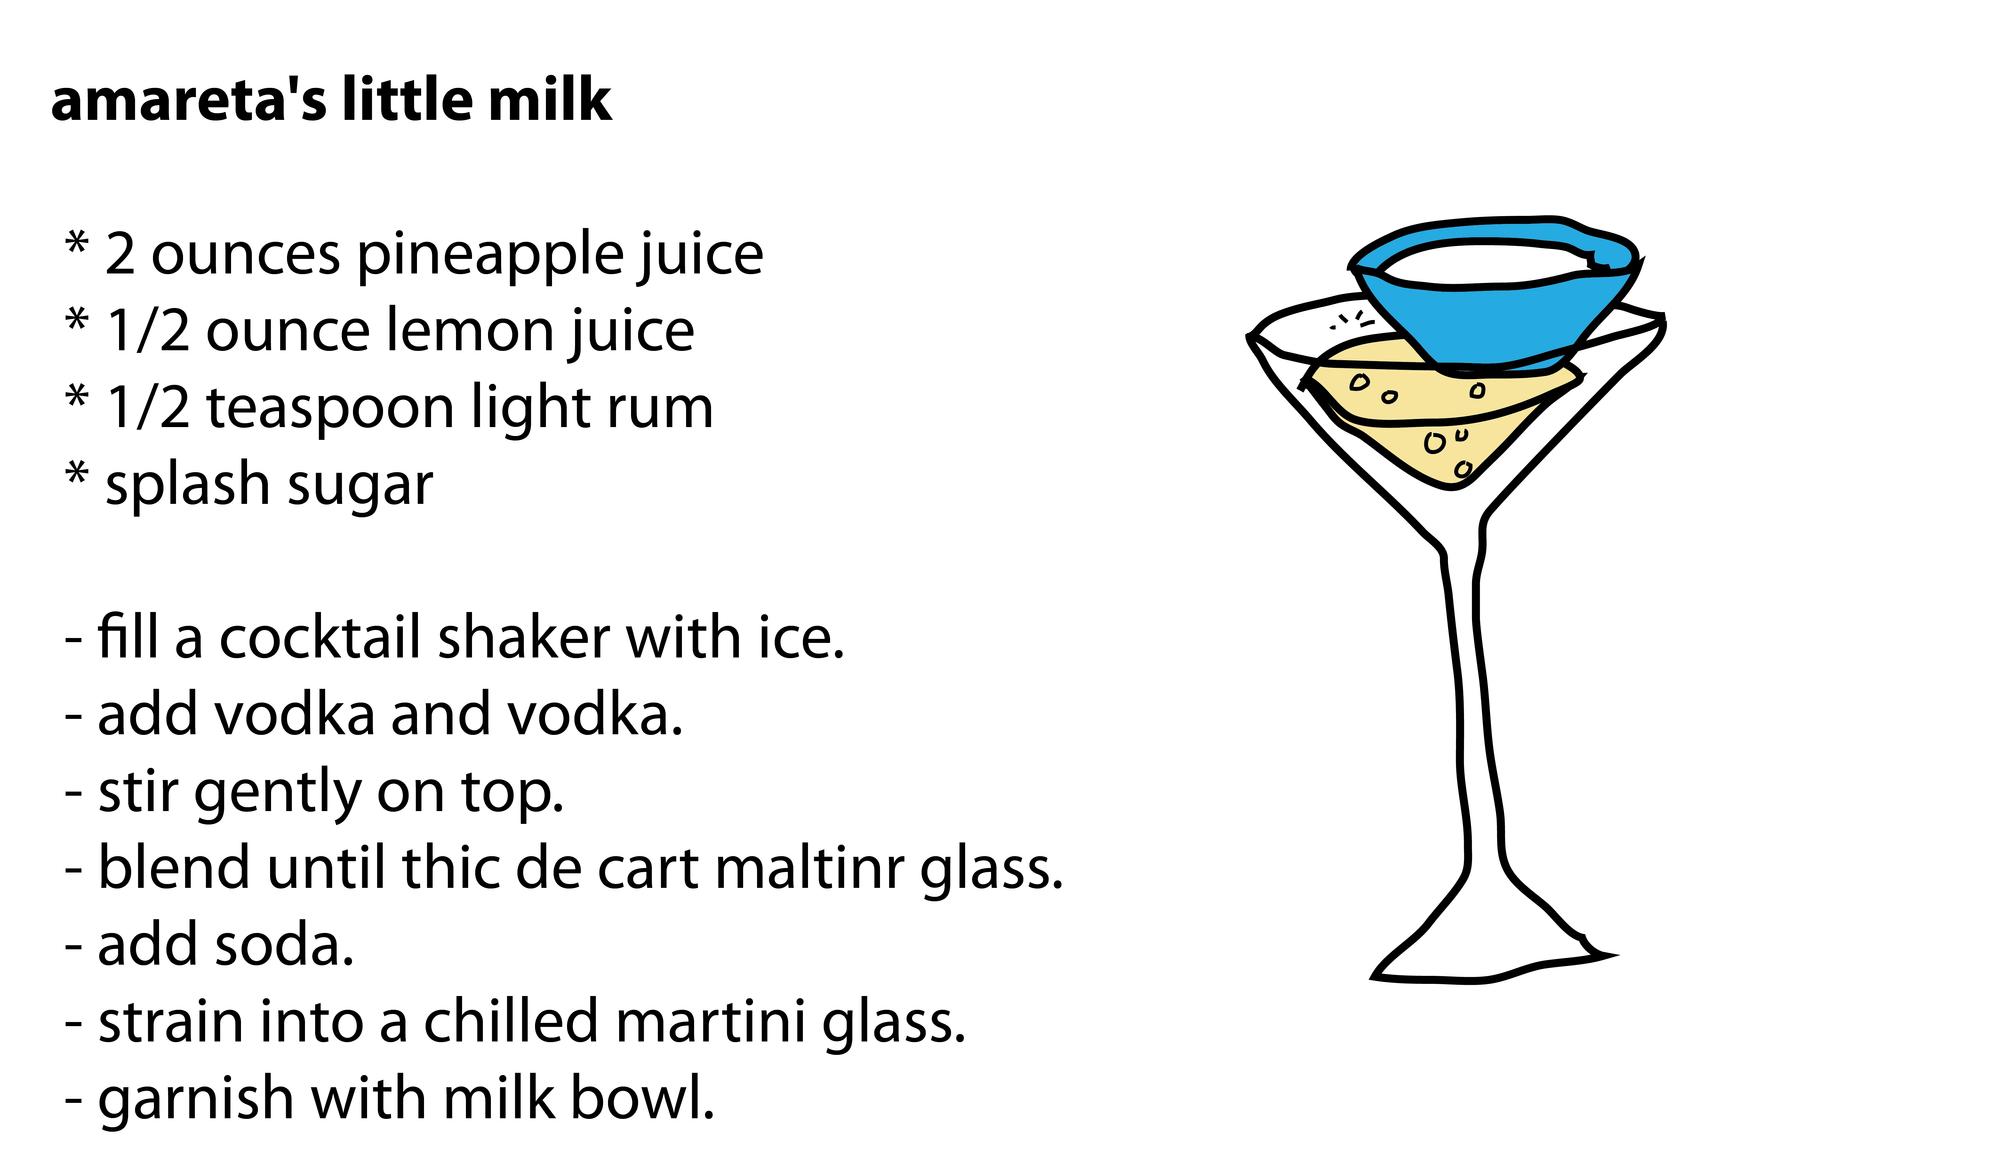 amareta's little milk   * 2 ounces pineapple juice  * 1/2 ounce lemon juice  * 1/2 teaspoon light rum  * splash sugar   - fill a cocktail shaker with ice.  - add vodka and vodka.  - stir gently on top.  - blend until thic de cart maltinr glass.  - add soda.  - strain into a chilled martini glass.  - garnish with milk bowl.